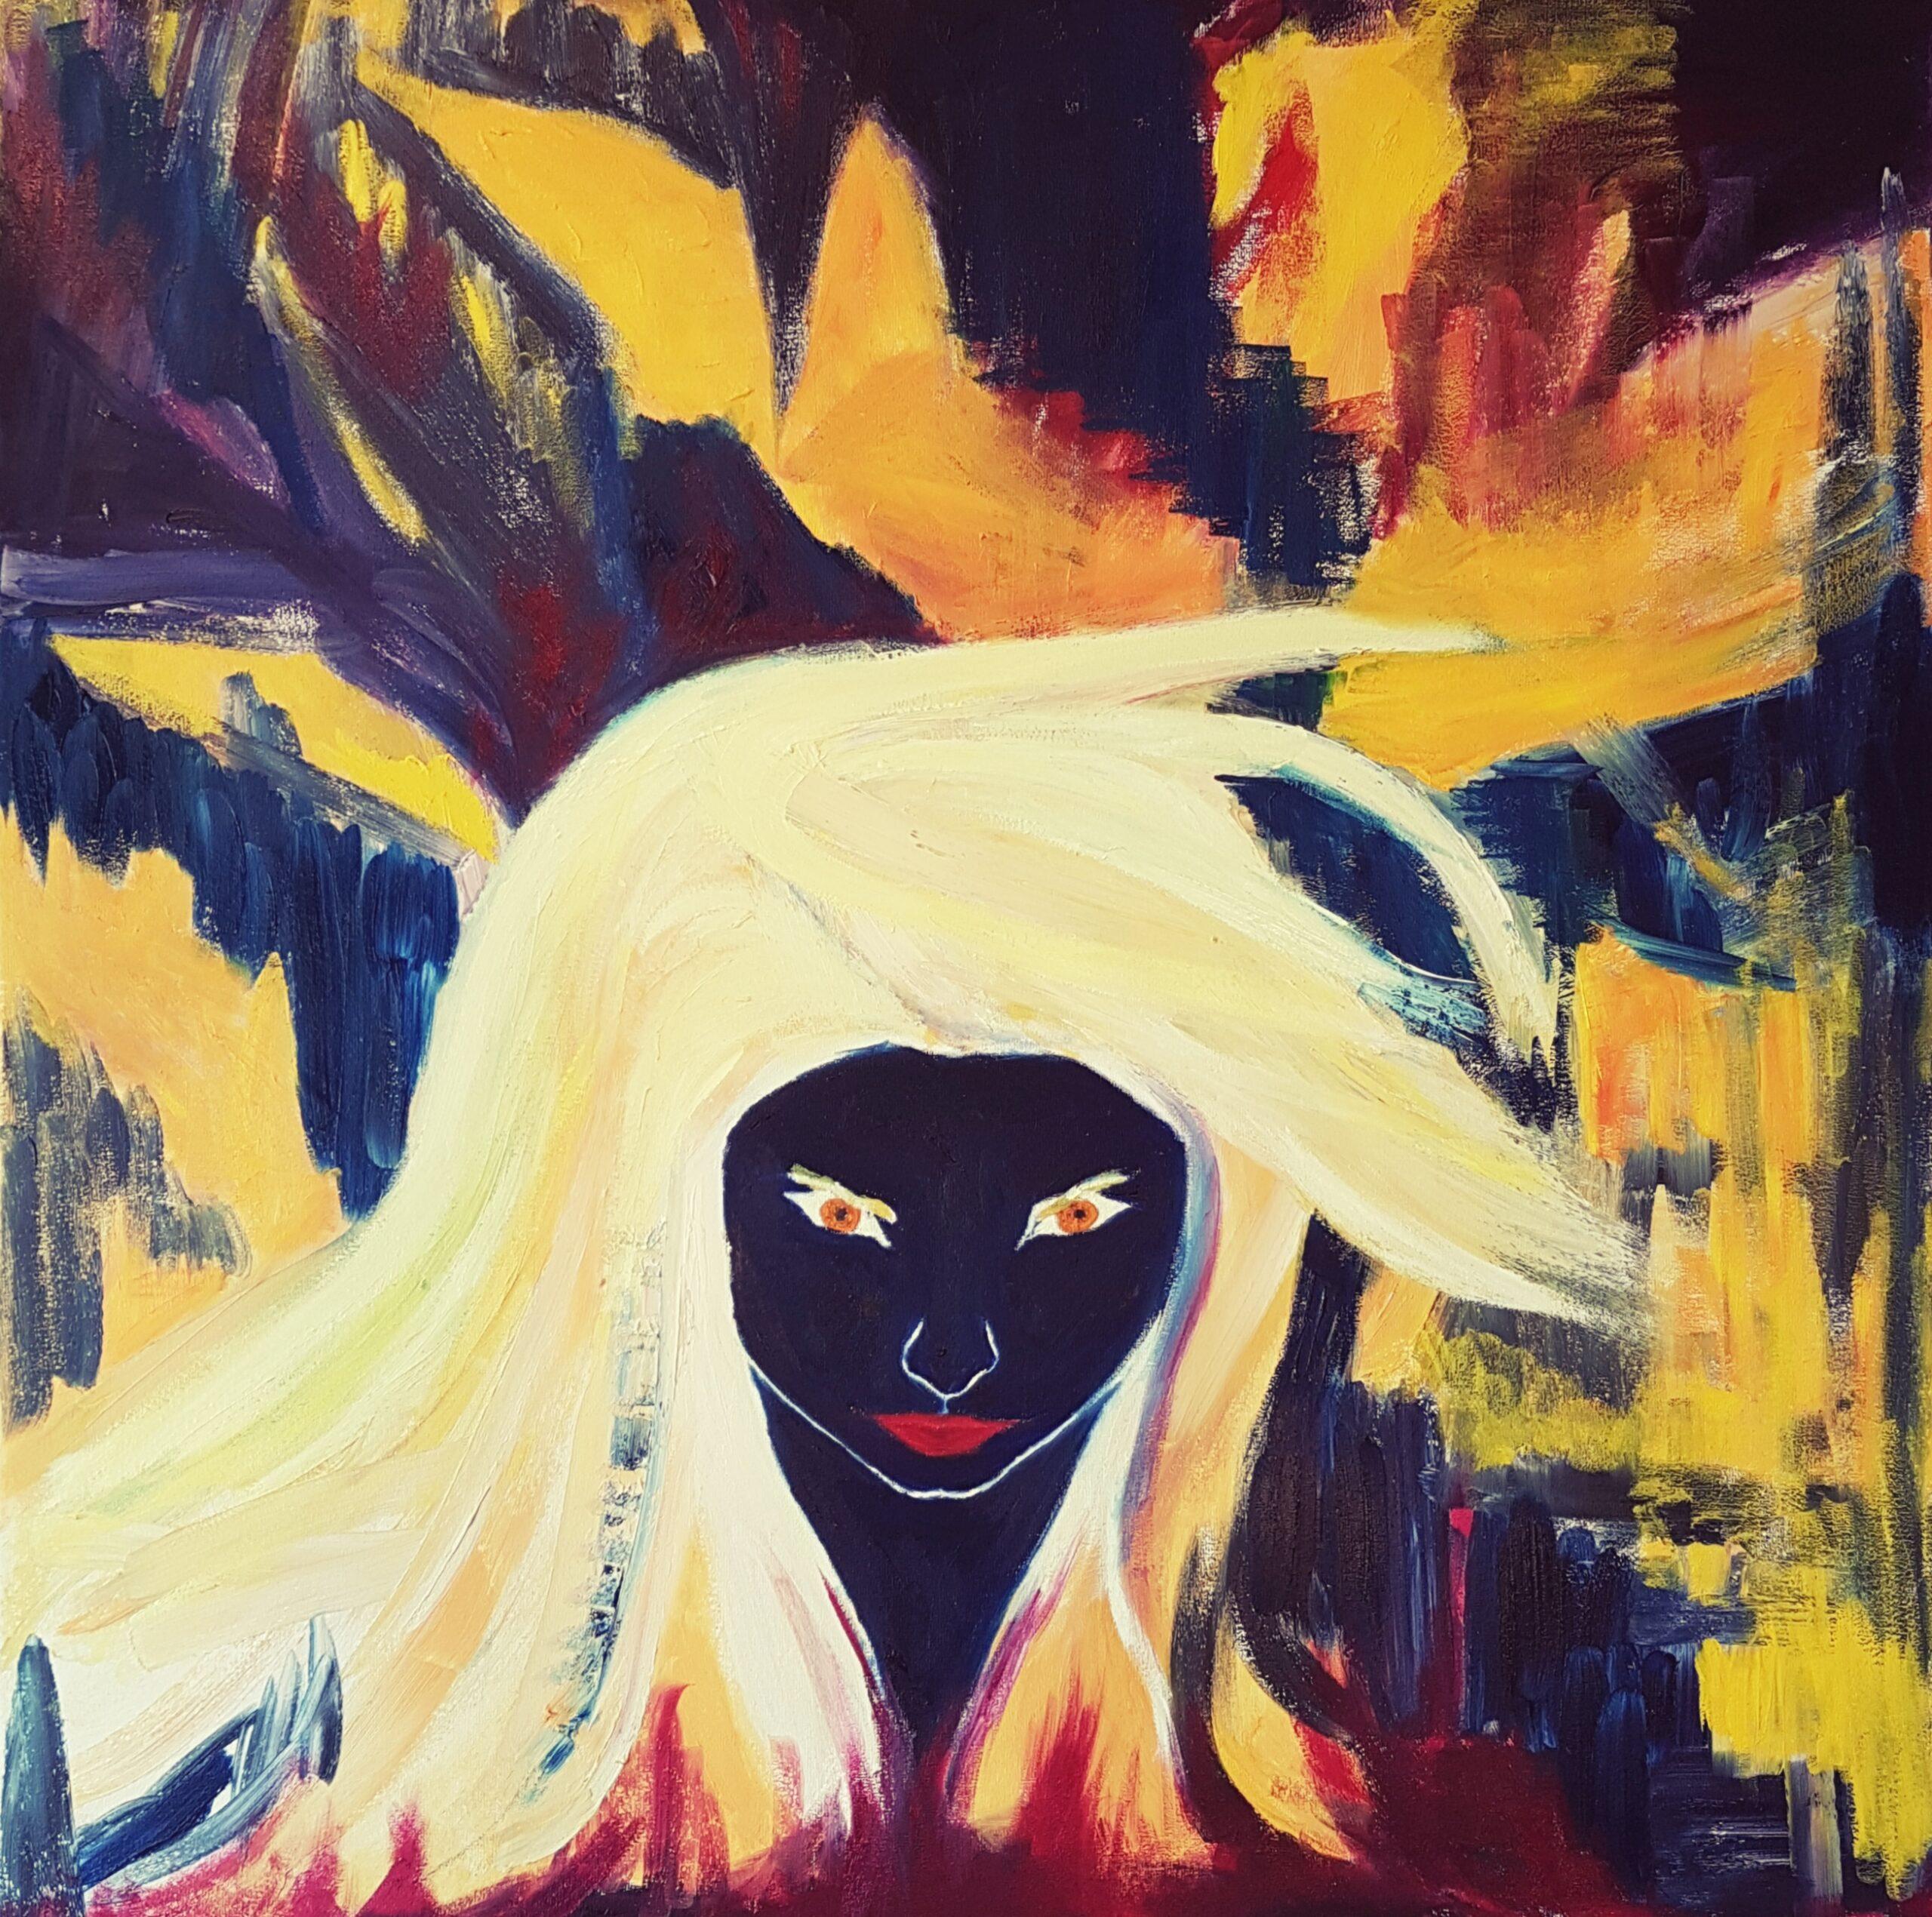 Artist Nelly Beck